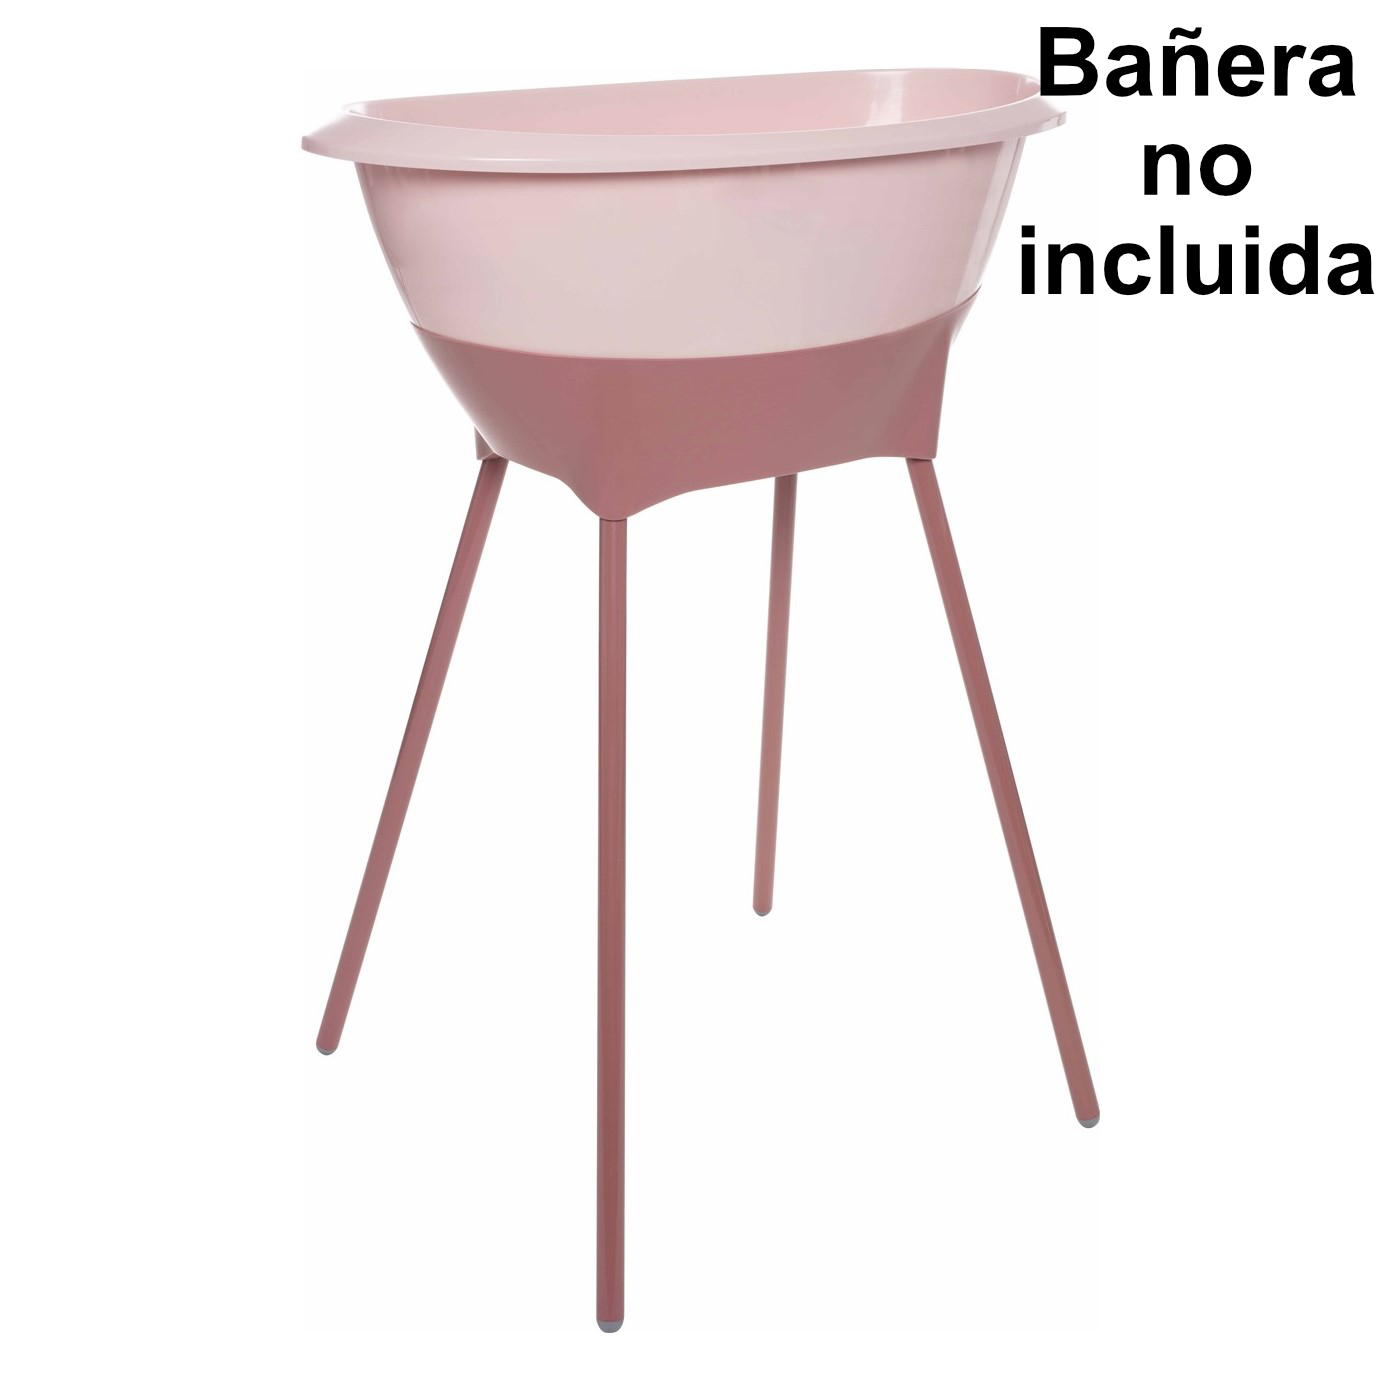 95413-SOPORTE BAÑERA LUMA ROSA OSCURO(2-0)-1